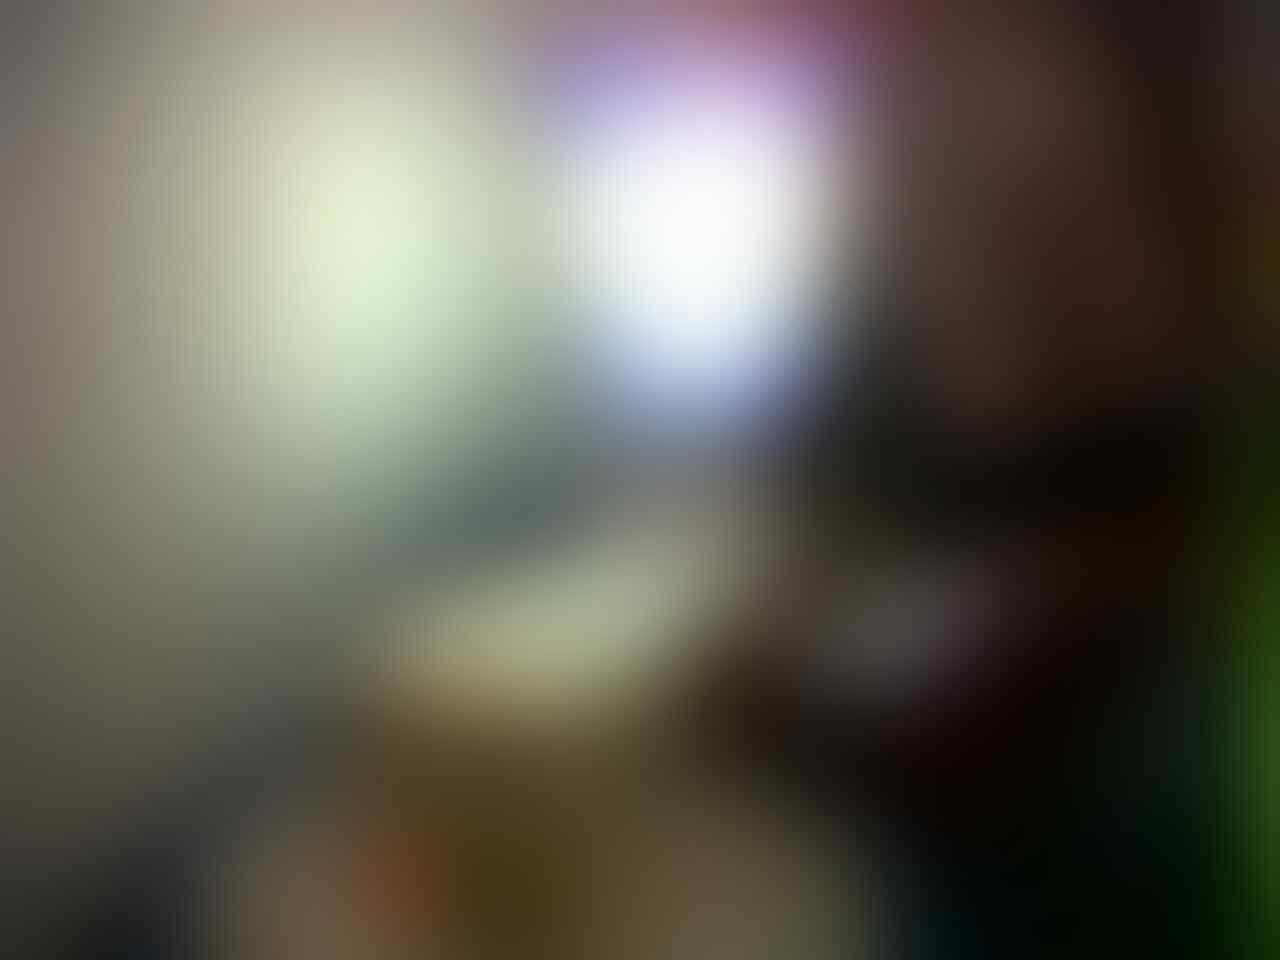 [TUTOR] Membuat Backlight Monitor PC (Cahaya Bias Dibelakang Monitor) Seharga 10 Ribu